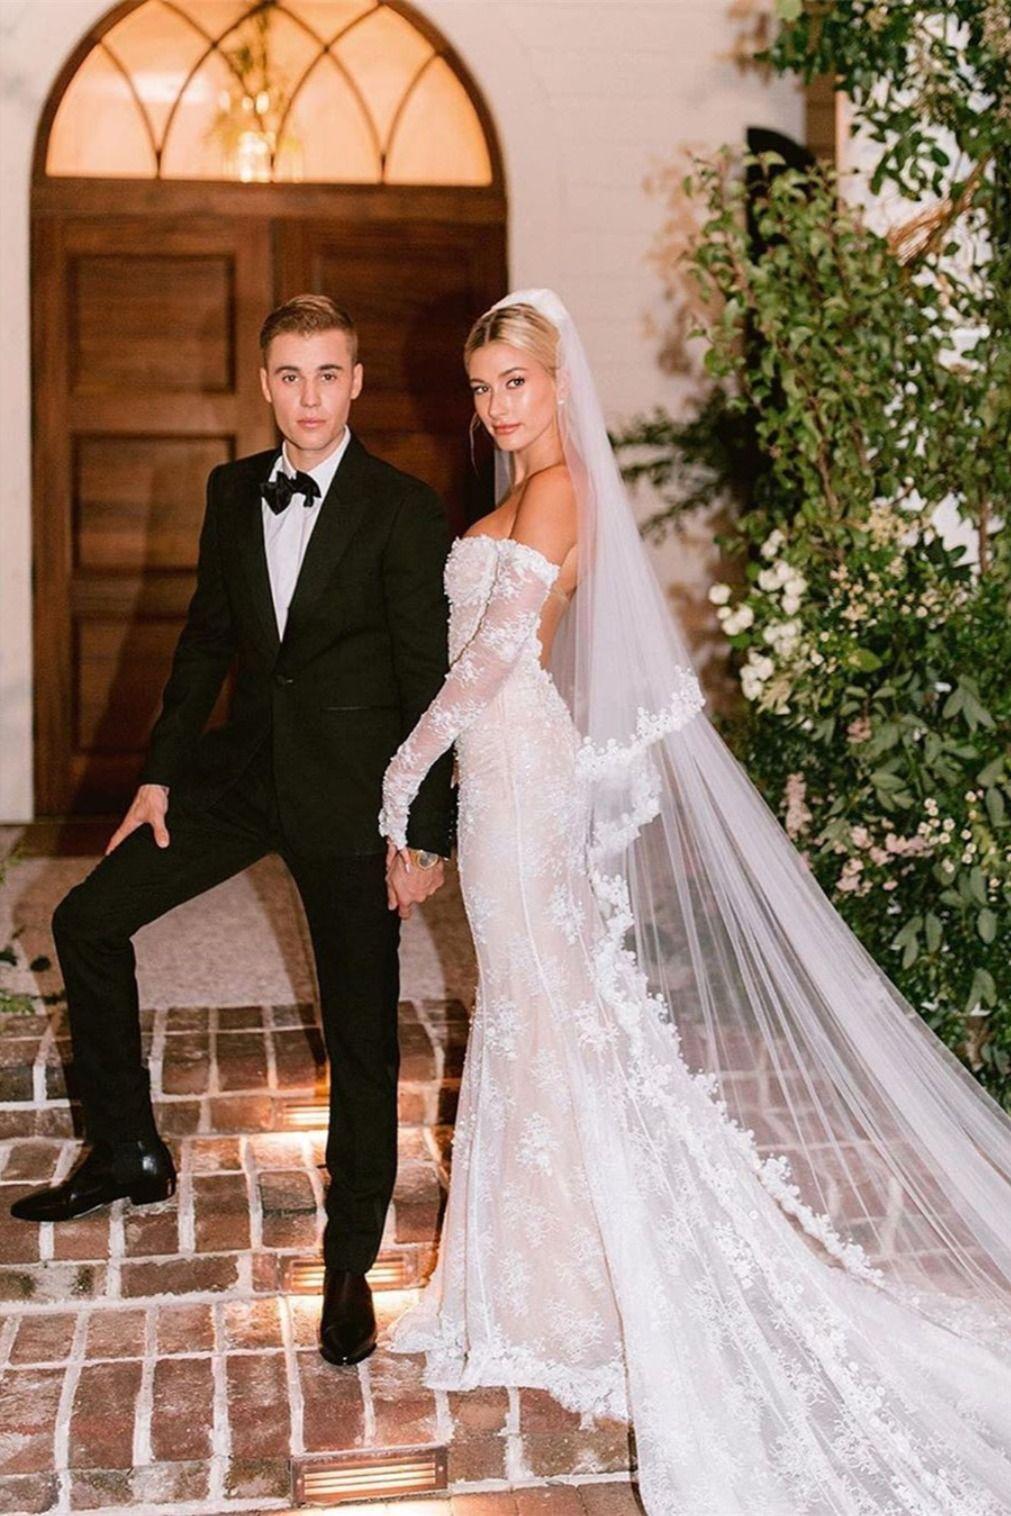 Long Sleeves Lace Wedding Dresses Mermaid Bridal Gowns Wd319 Wedding Dresses Celebrity Wedding Gowns Hailey Bieber Wedding [ 1516 x 1011 Pixel ]